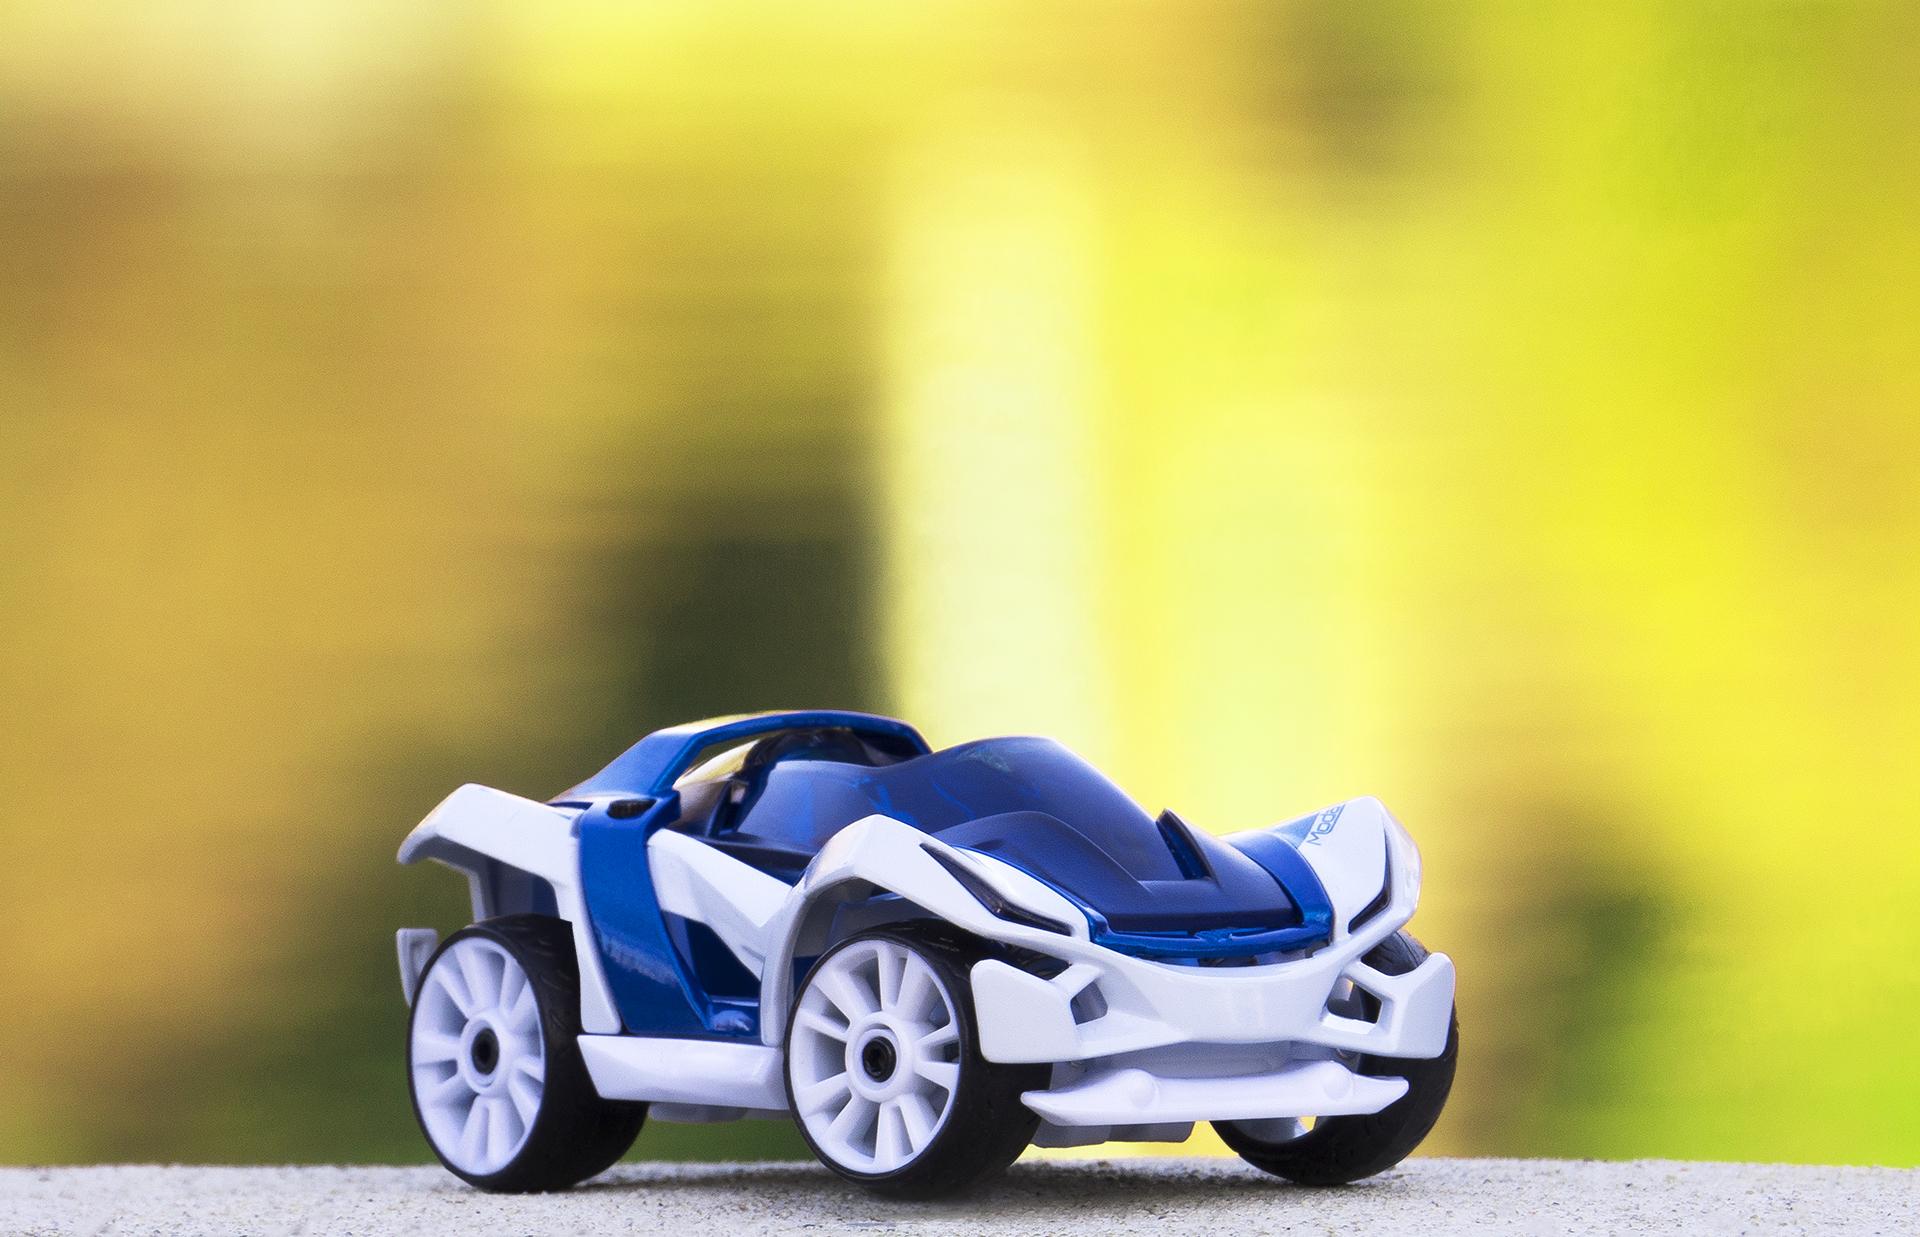 C1 S1 Concept hybrid green bokeh background lifestyle 2018